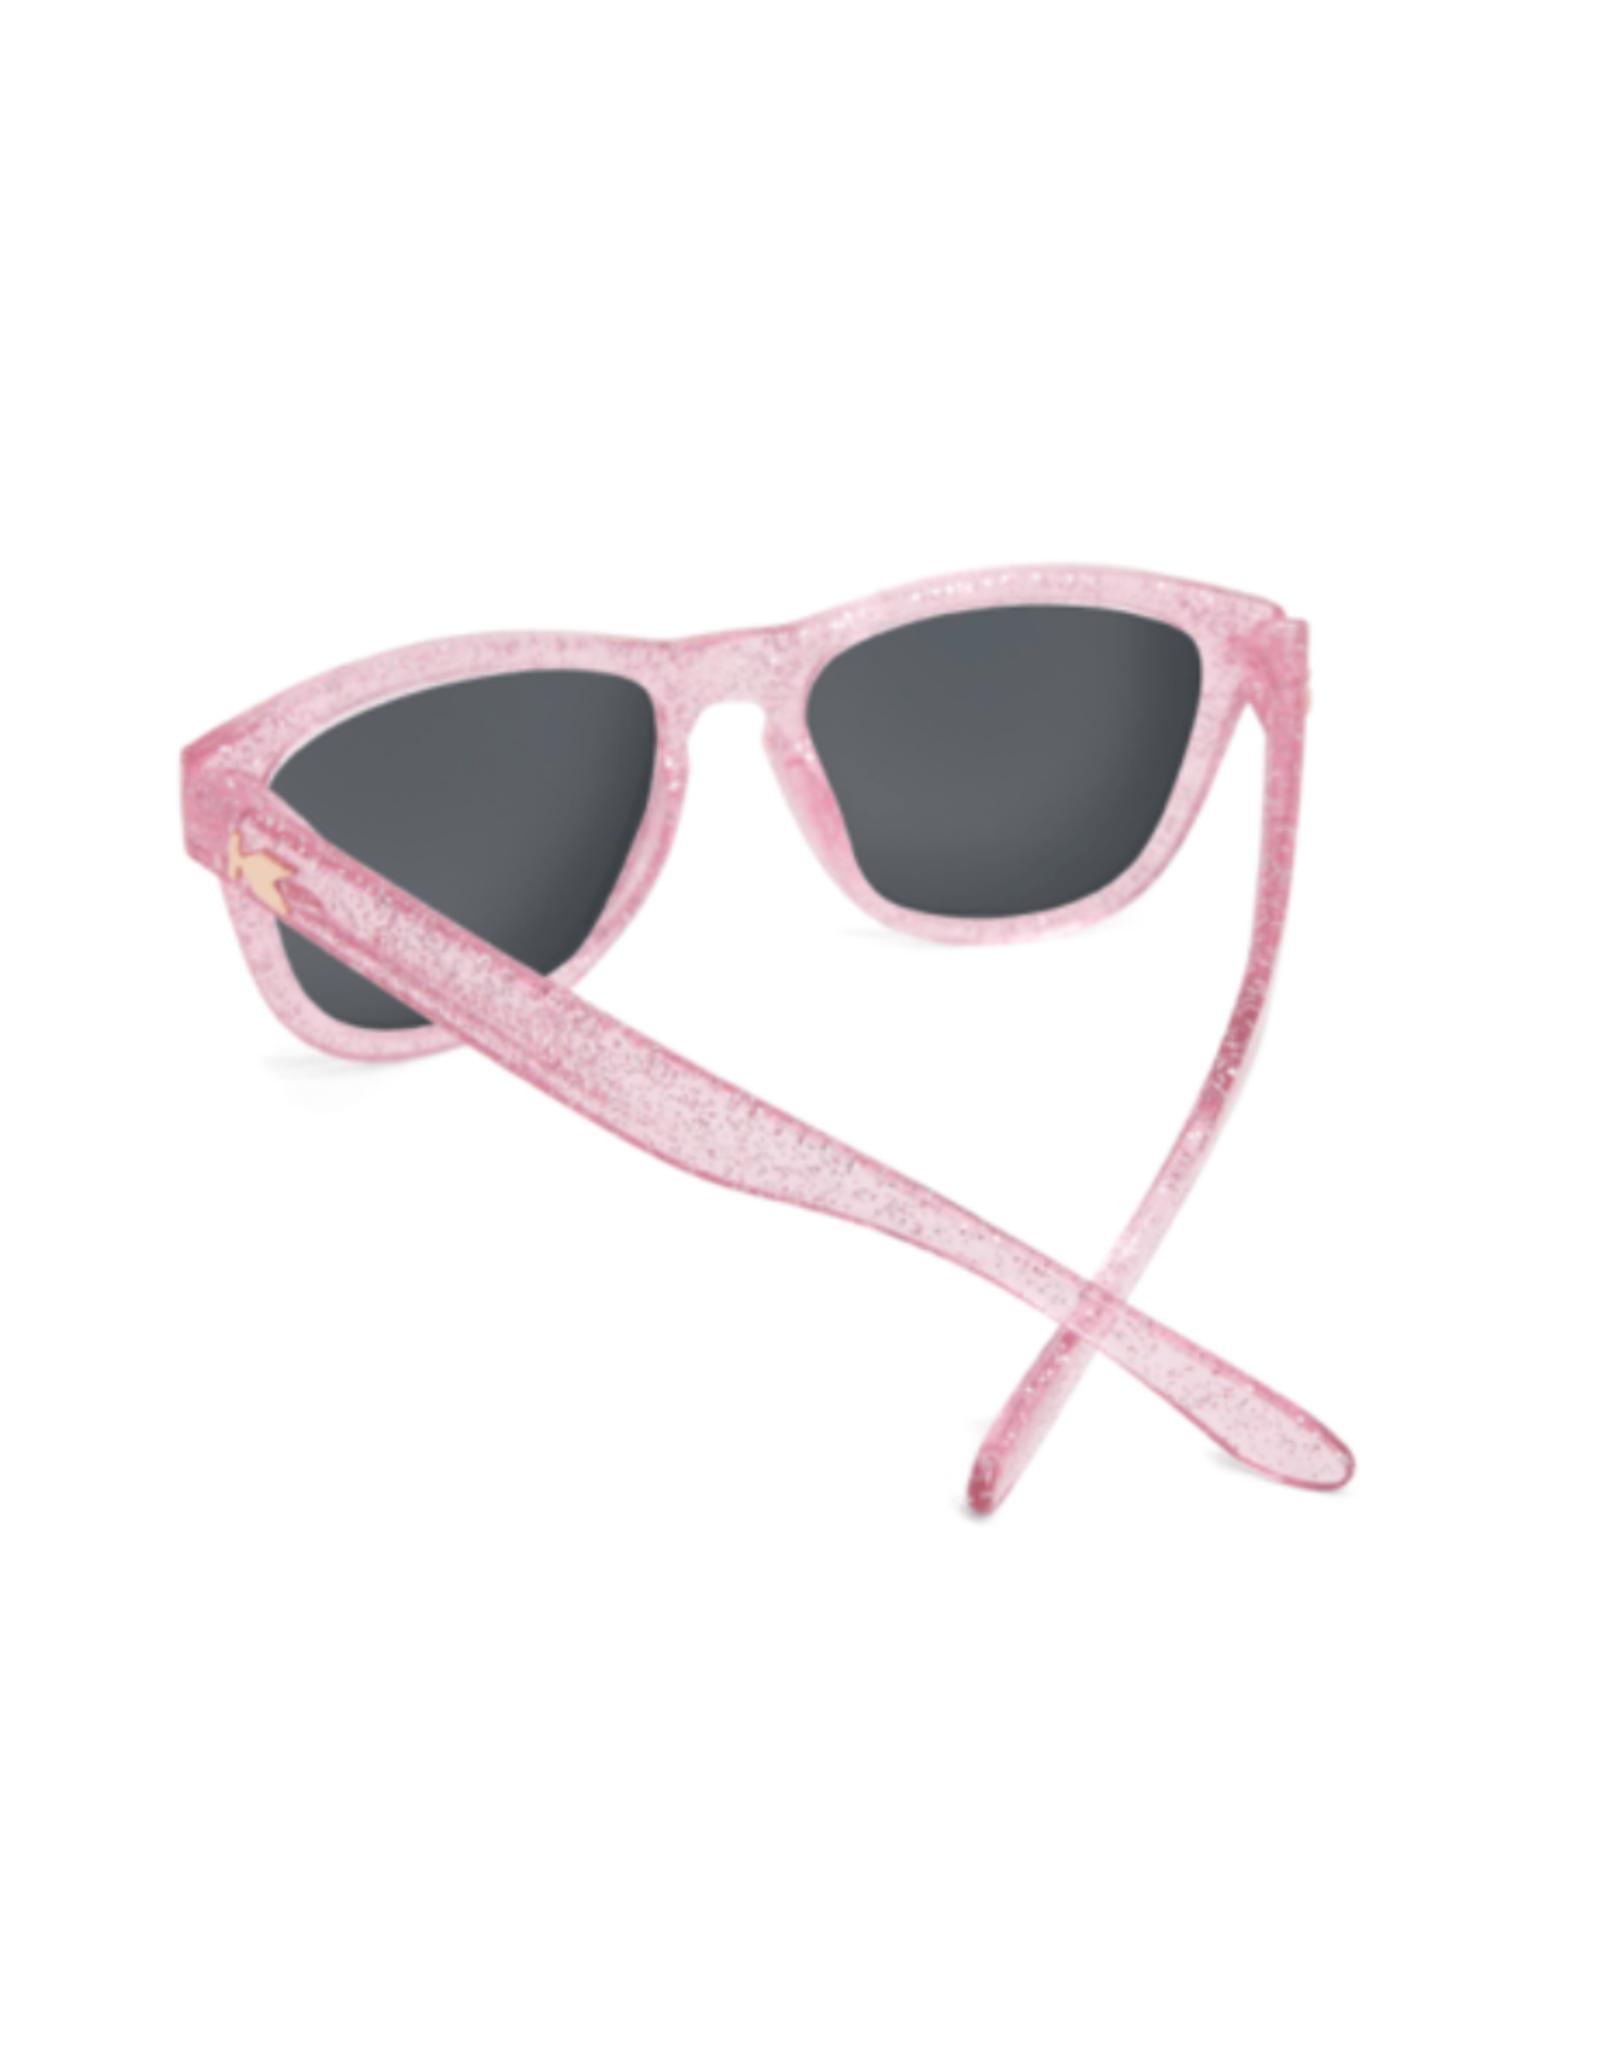 Knockaround Sunnies Pink Sparkle